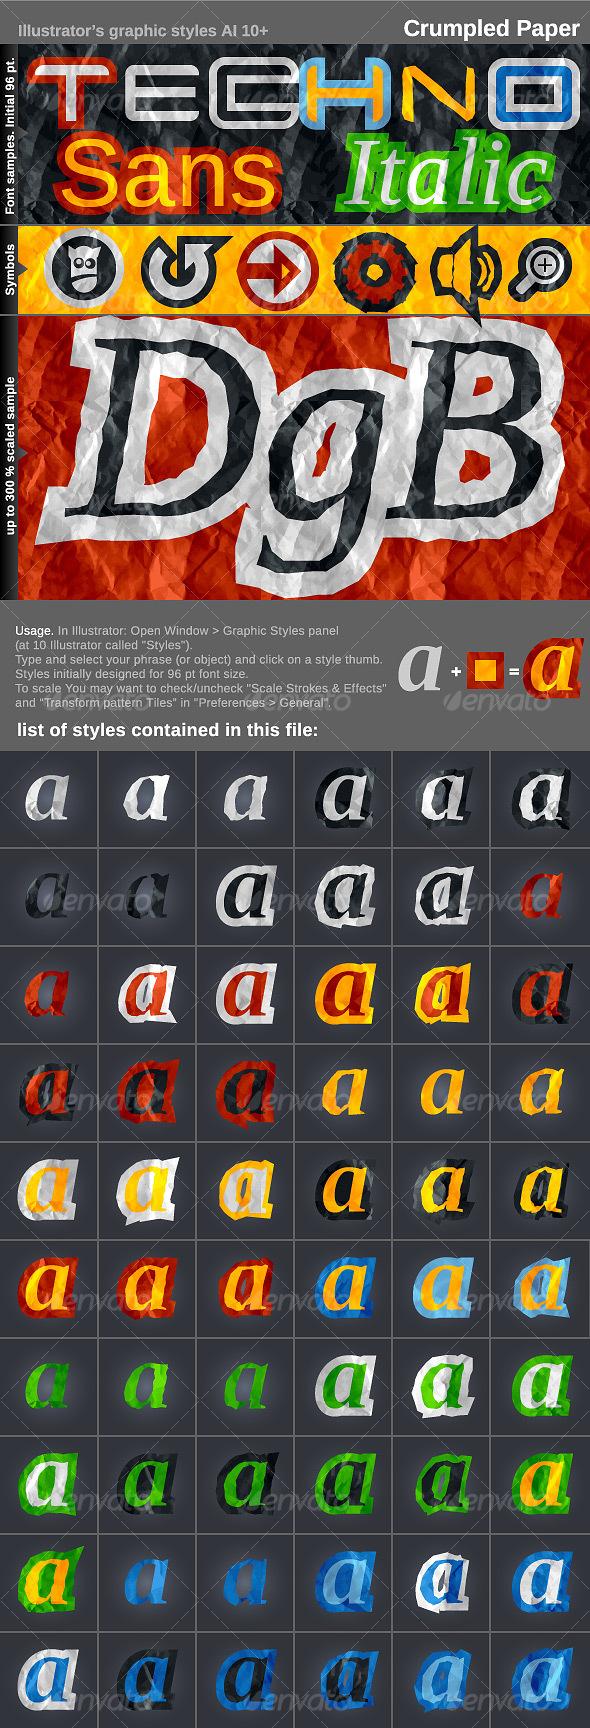 Illustrator's styles AI CS+. Crumpled Paper. - Styles Illustrator